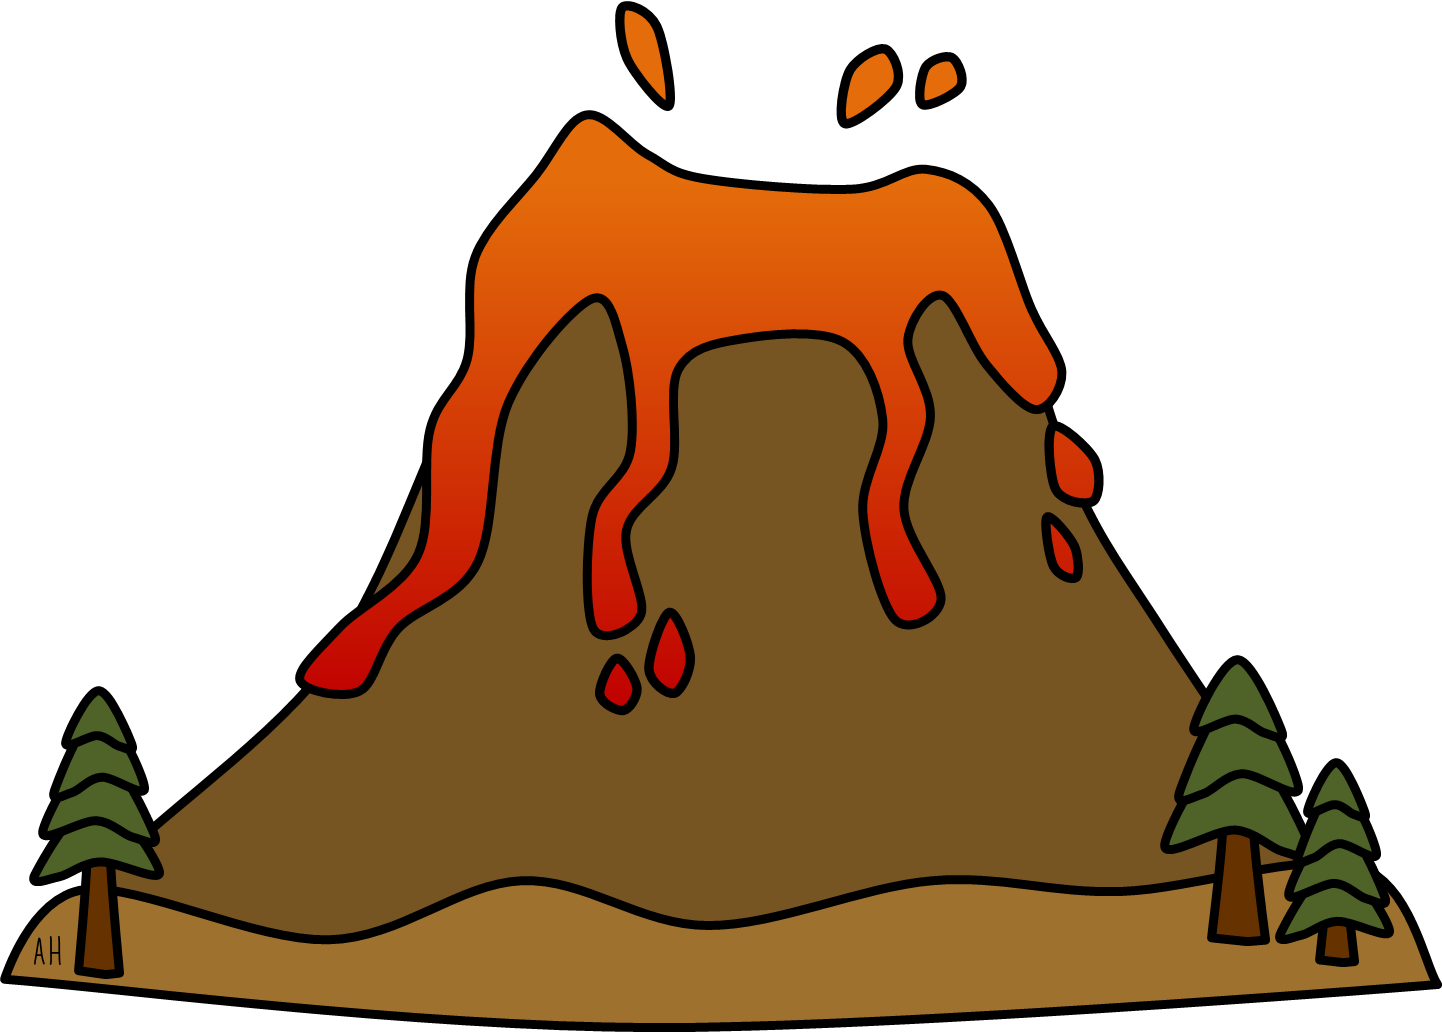 Volcano clip art free. Earthquake clipart volcanic eruption